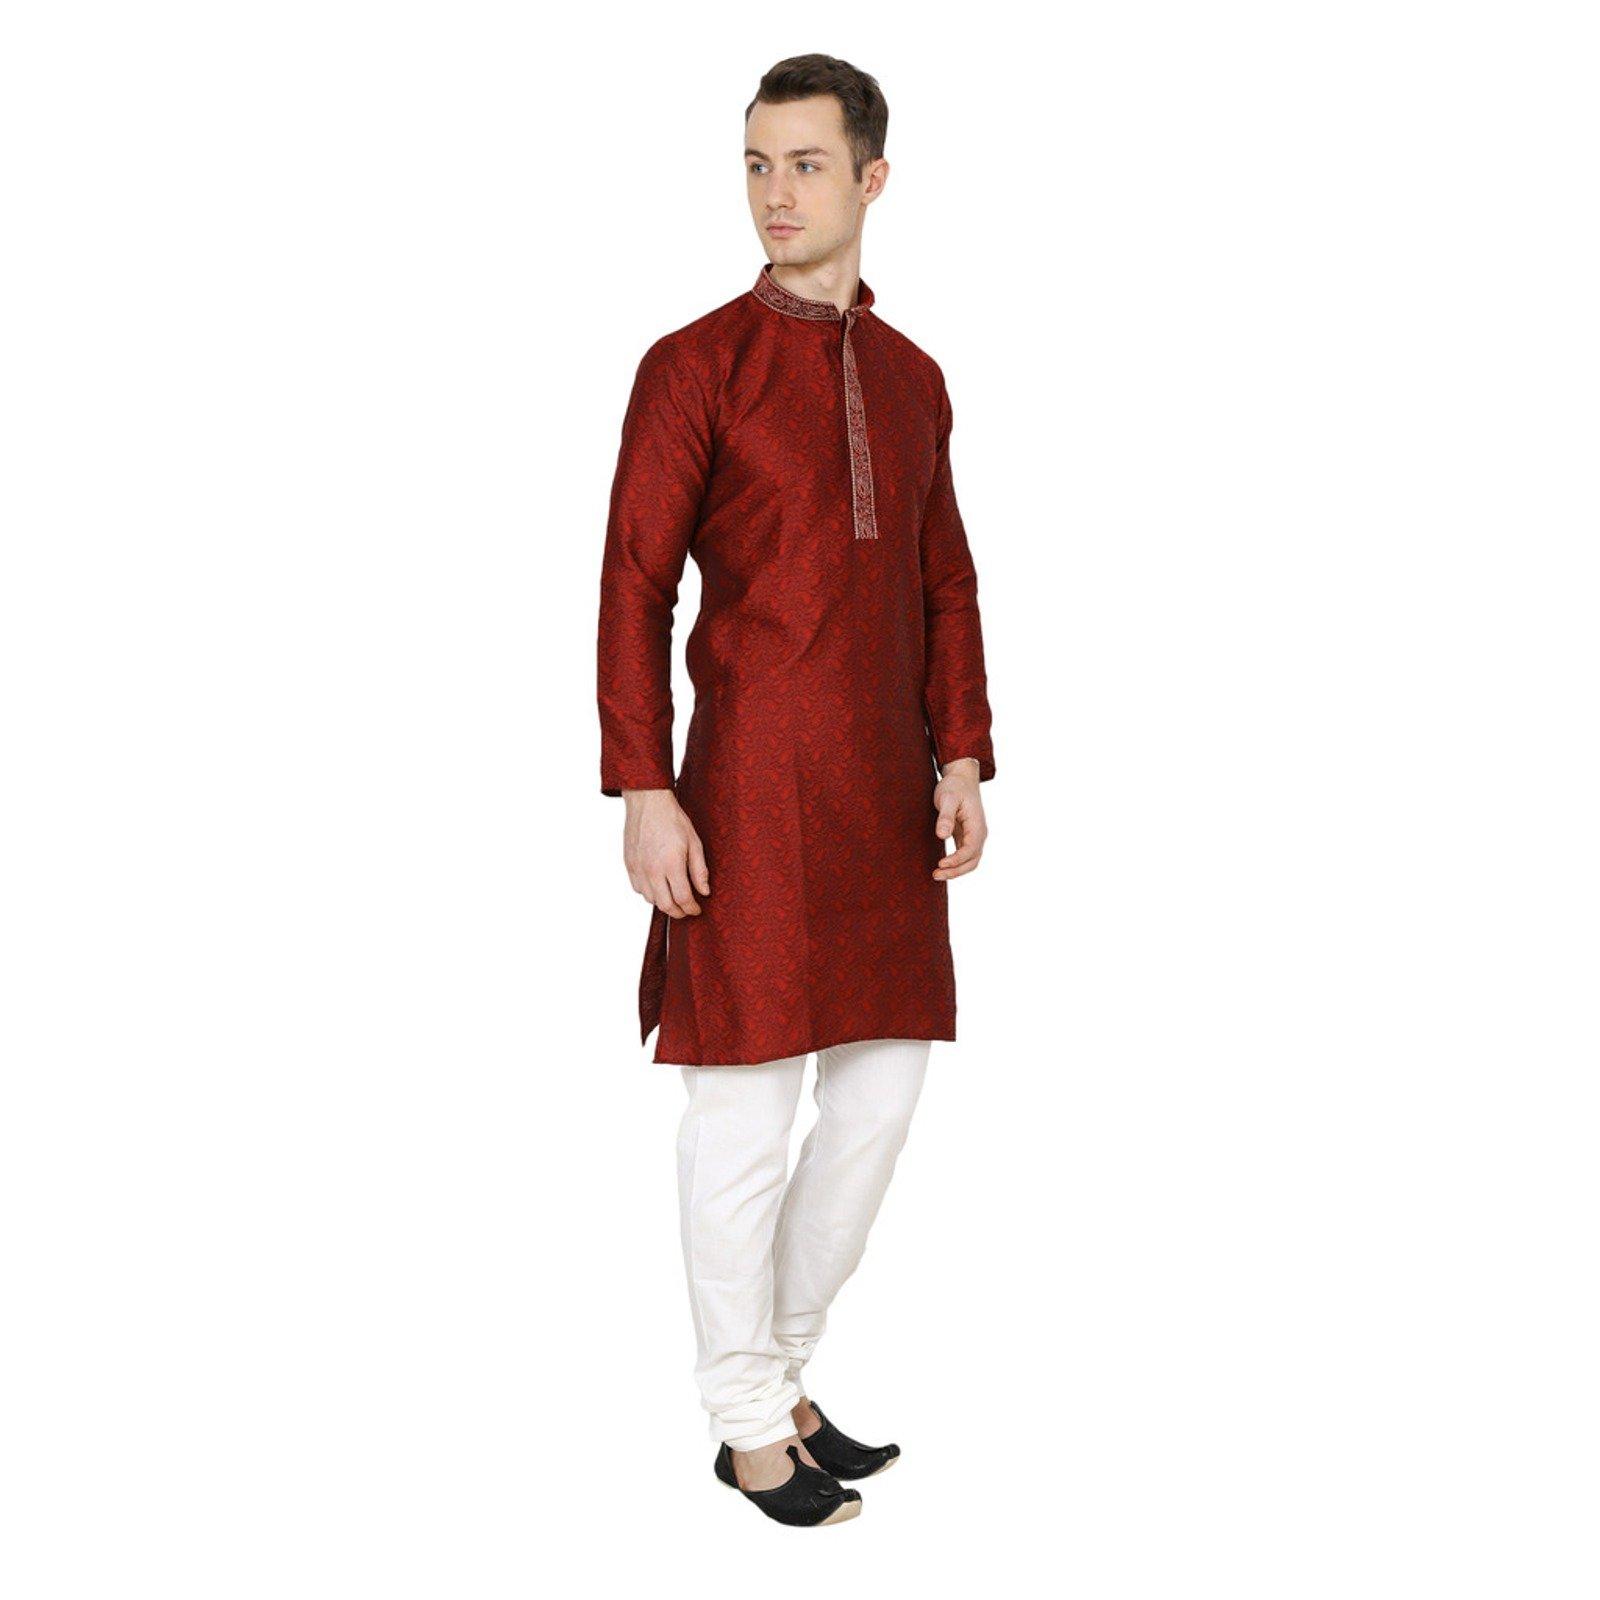 RUCHI MART Kurta Pajama Ethnic Indian Mens Designer Traditional Wedding Wear